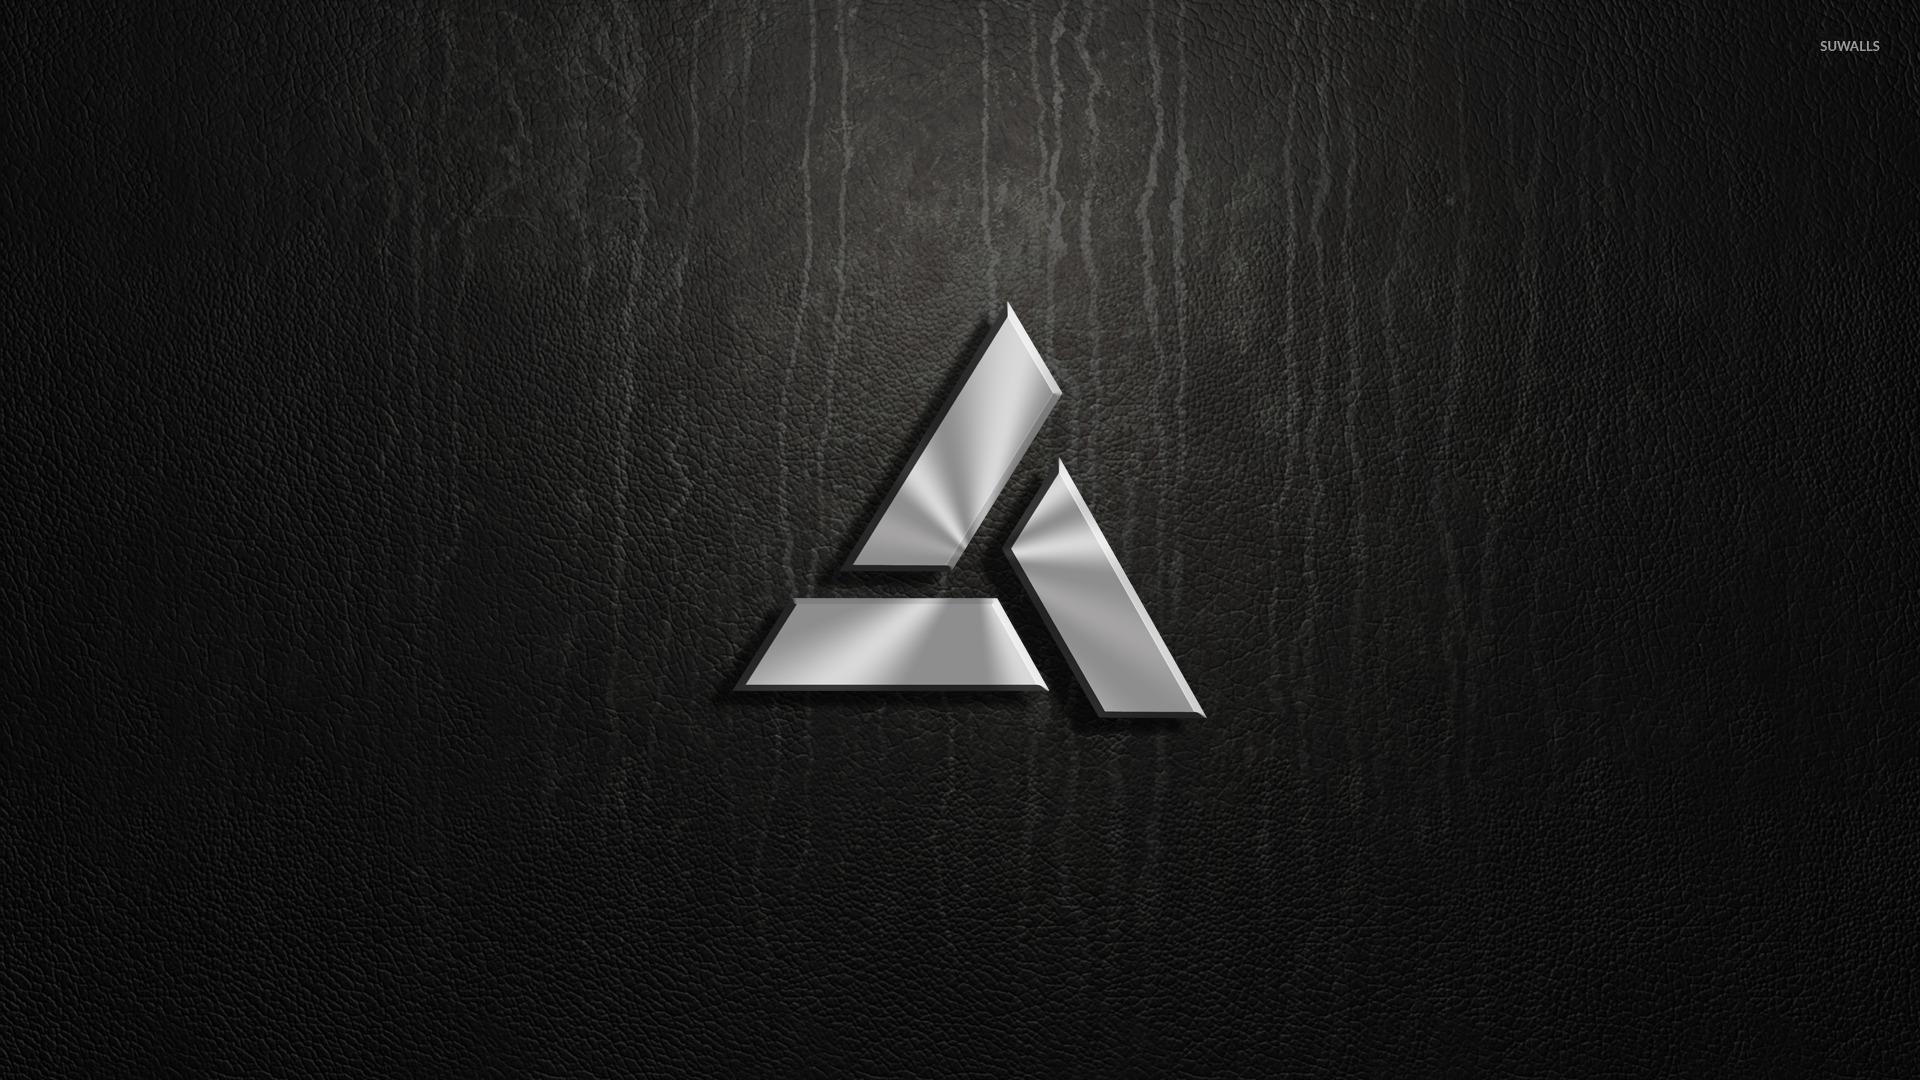 Skyrim Iphone X Wallpaper Assassin S Creed 7 Wallpaper Game Wallpapers 44873